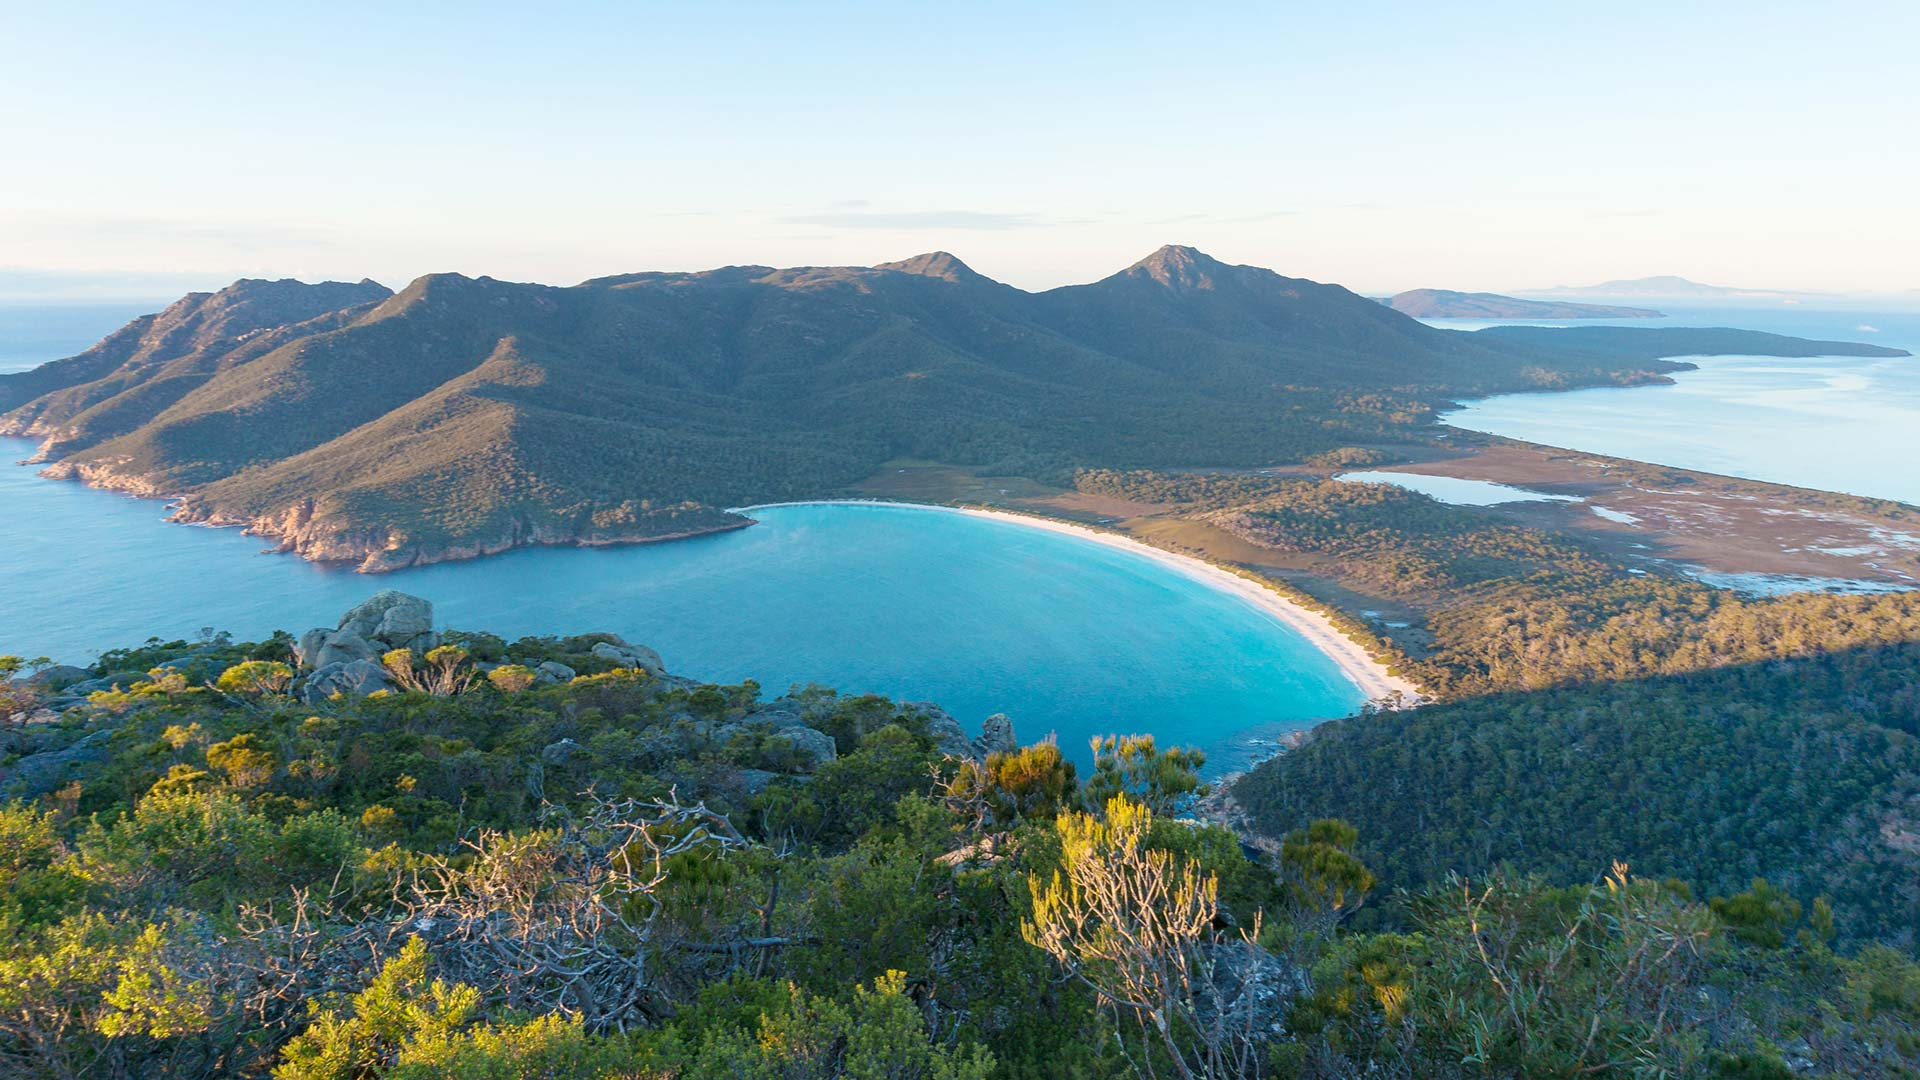 Tasmania sign singles up -0 Top 10